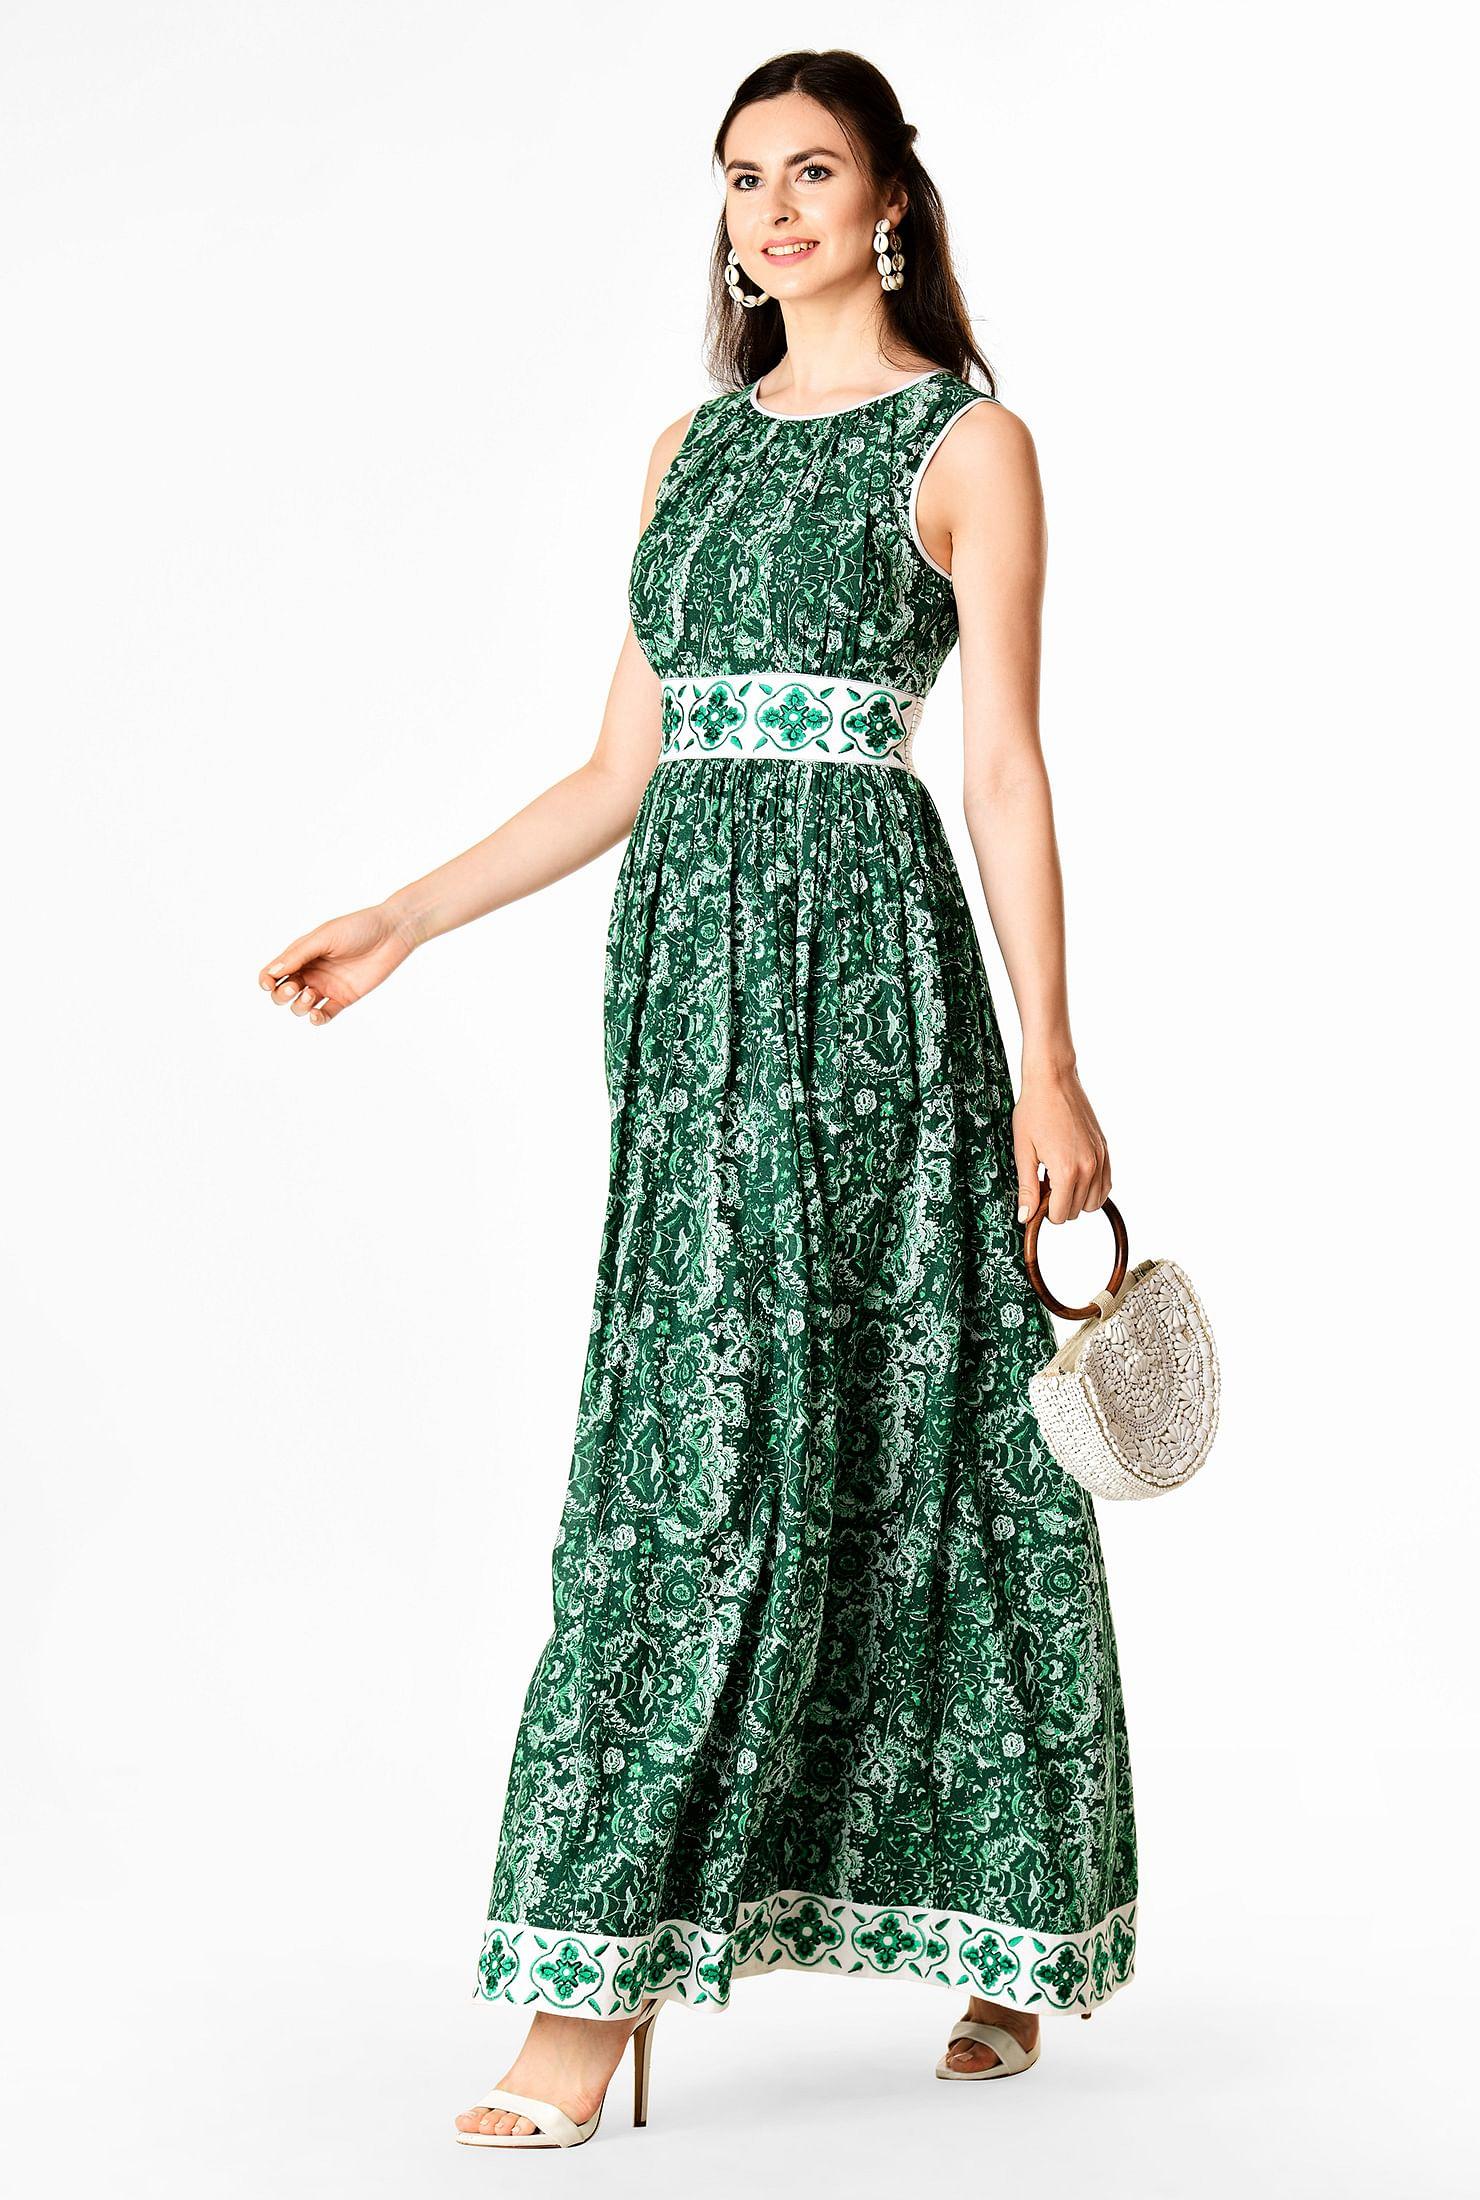 Floral print cotton embellished trim ruched maxi dress